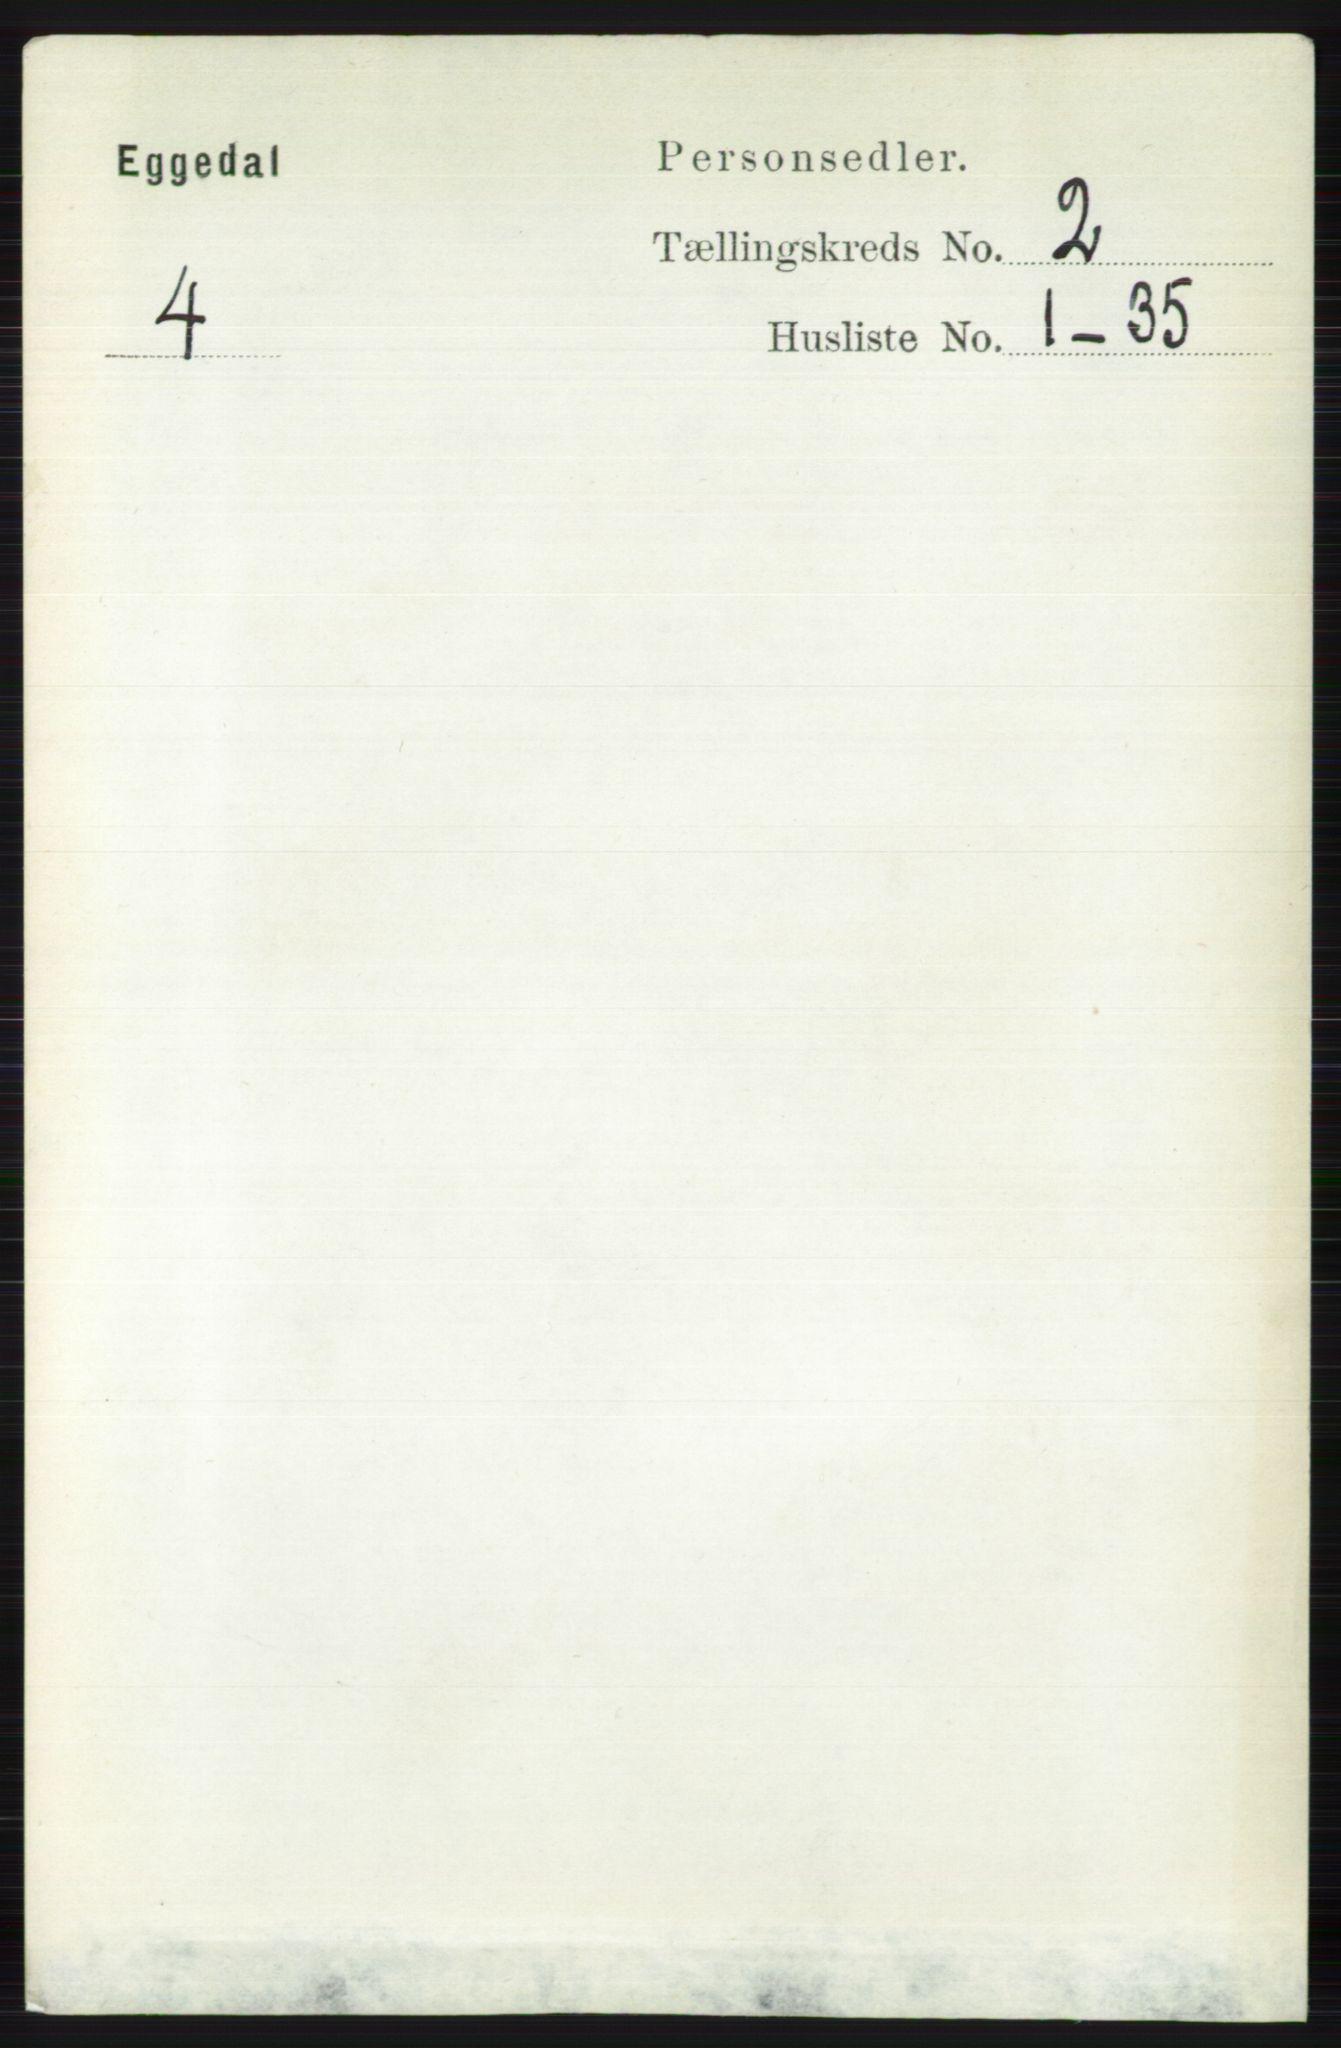 RA, Folketelling 1891 for 0621 Sigdal herred, 1891, s. 3917